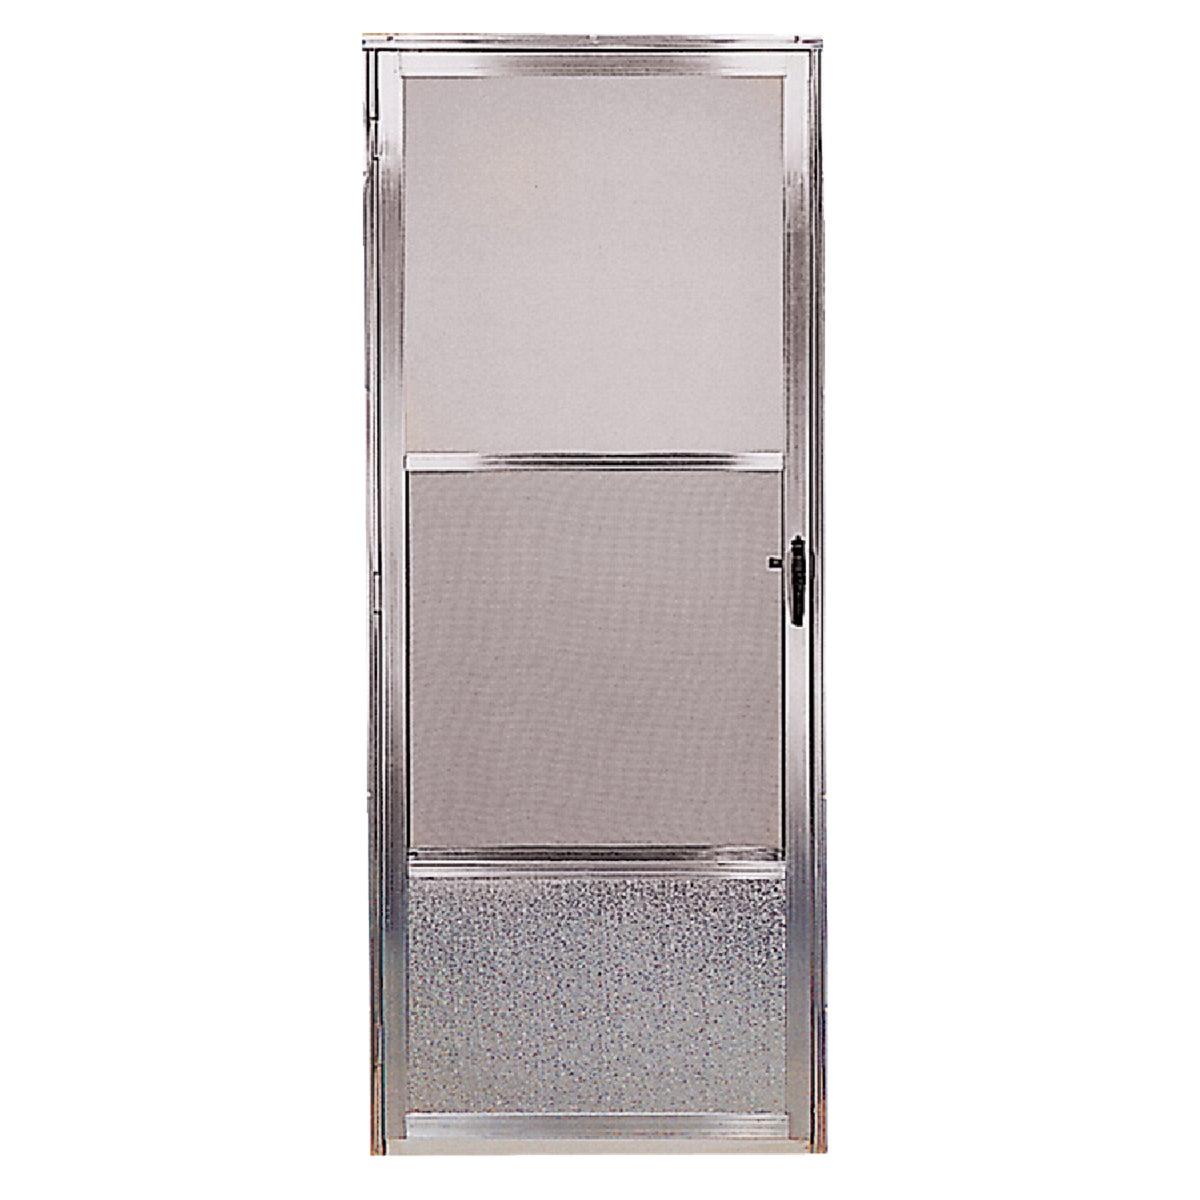 161 3068 RH MILL DOOR